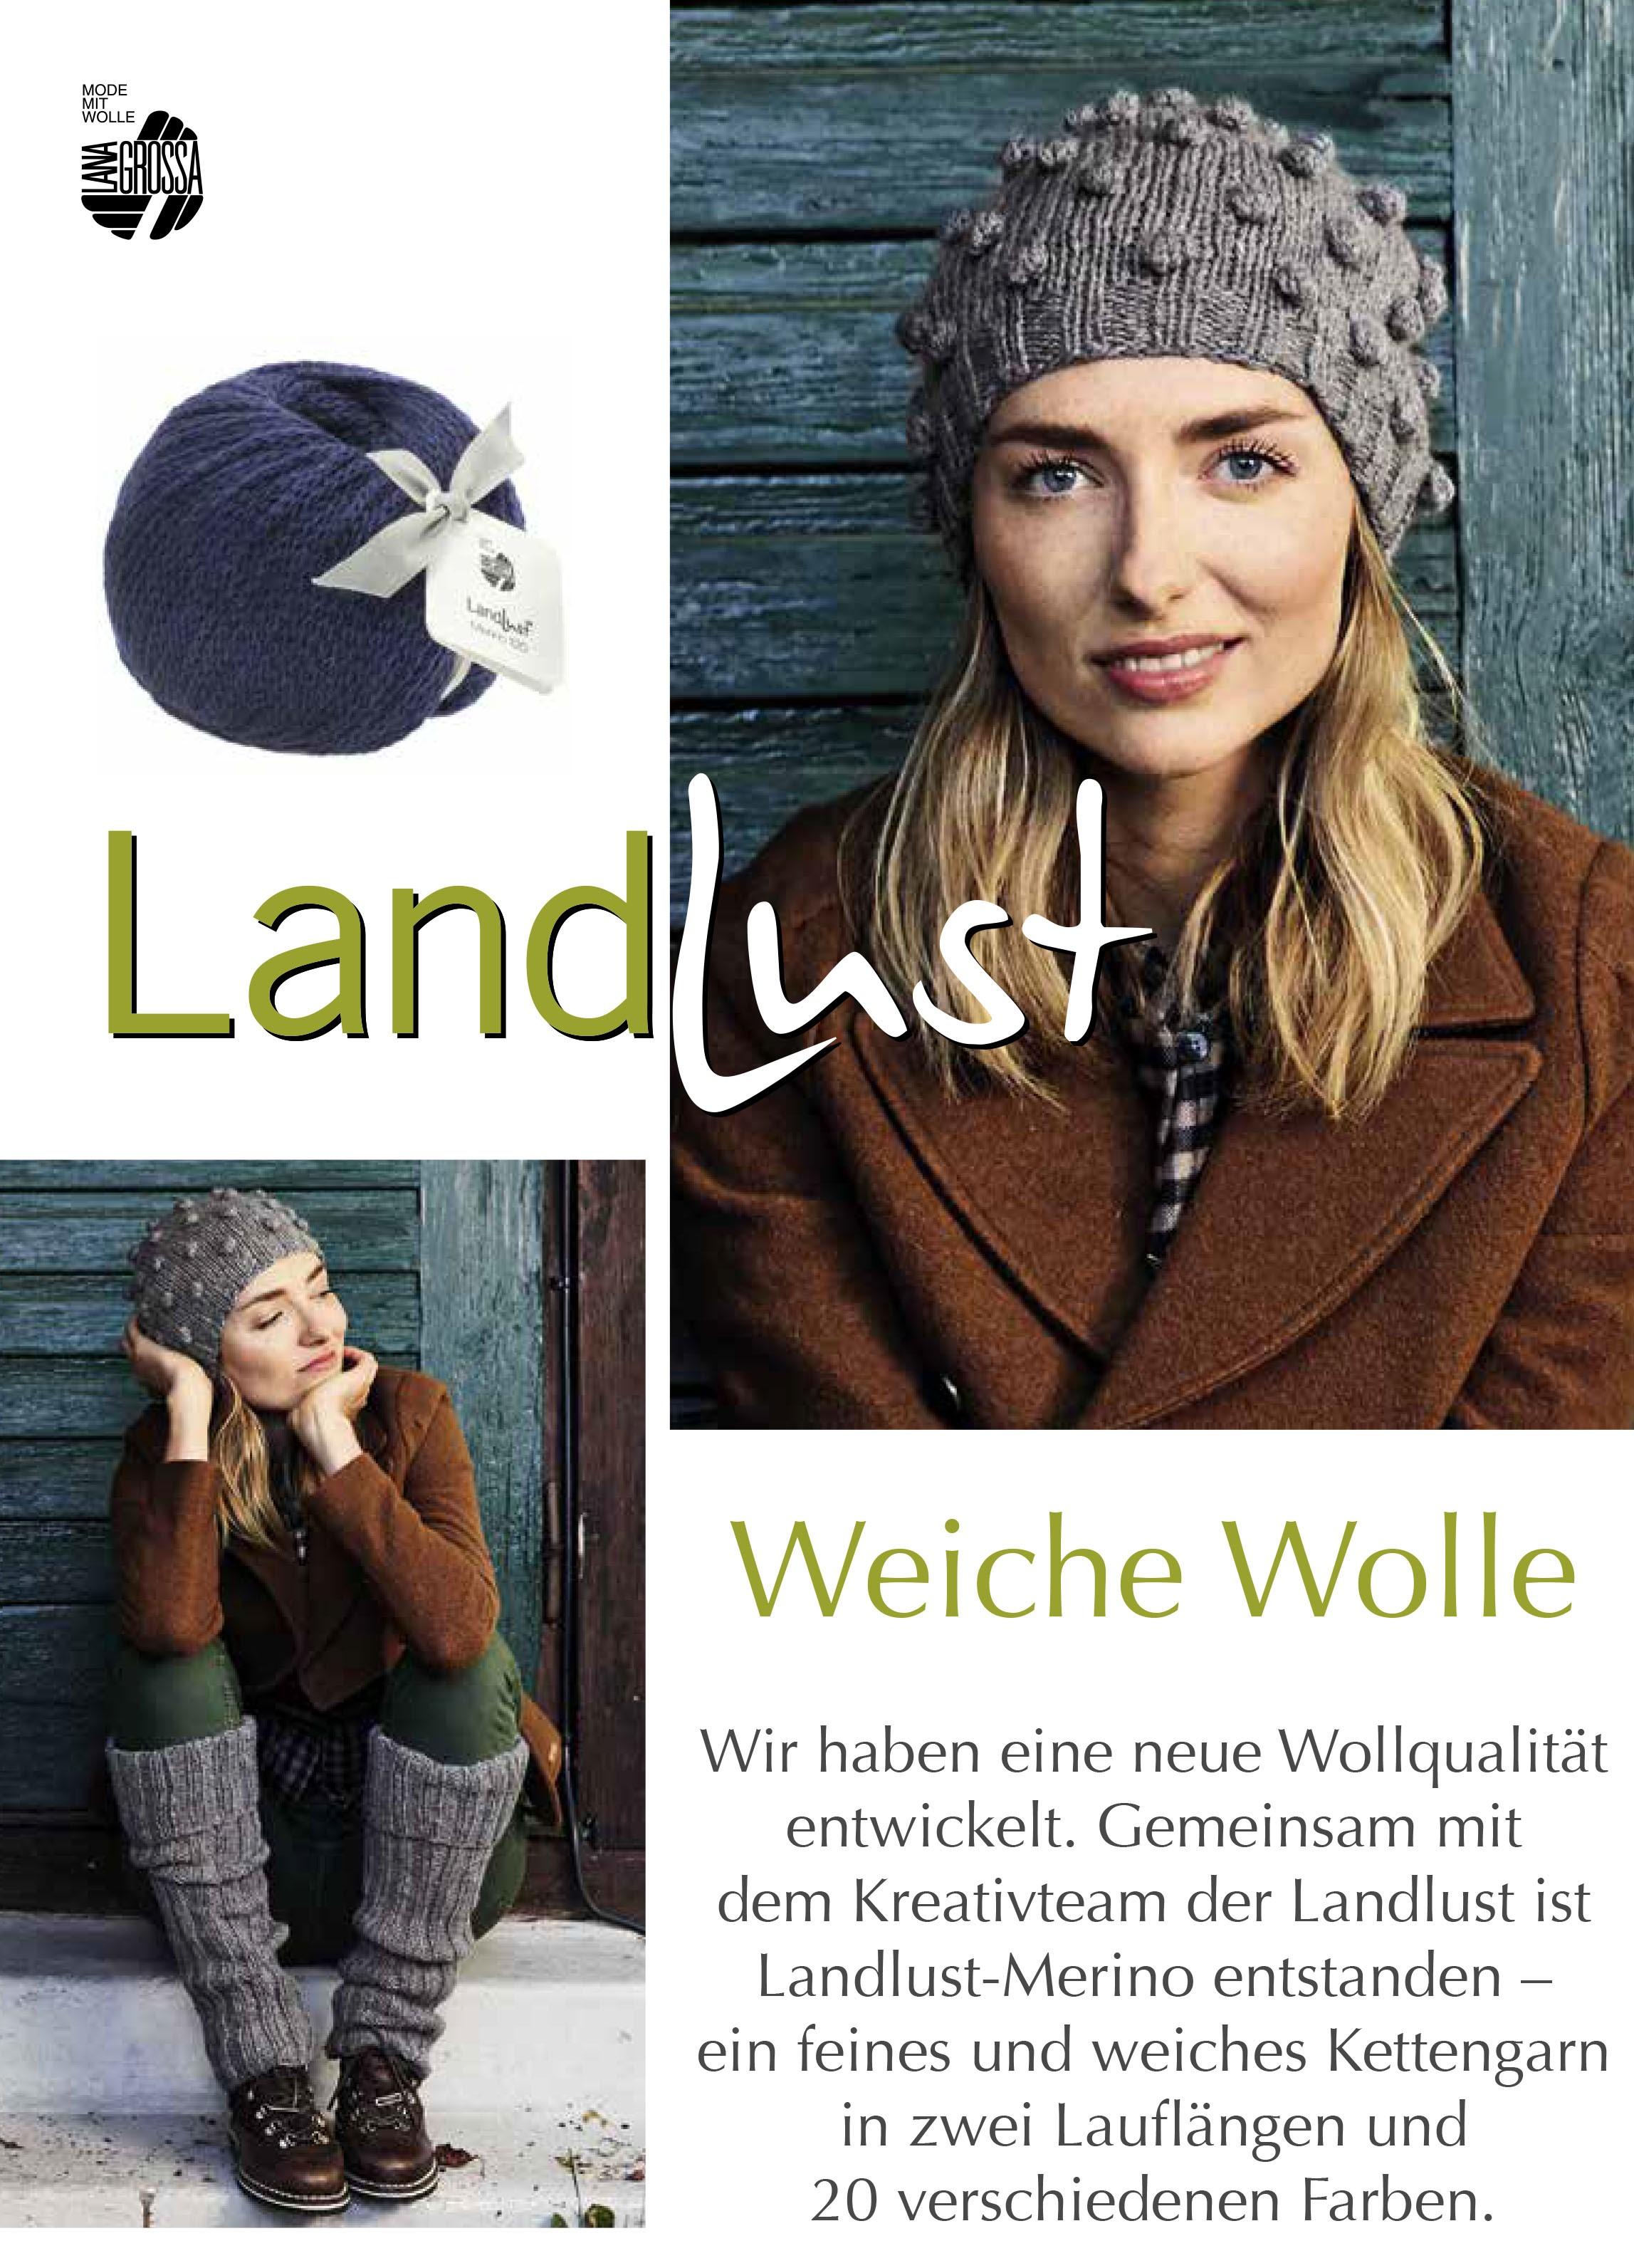 Lana Grossa LANDLUST Flyer 2 - German Edition